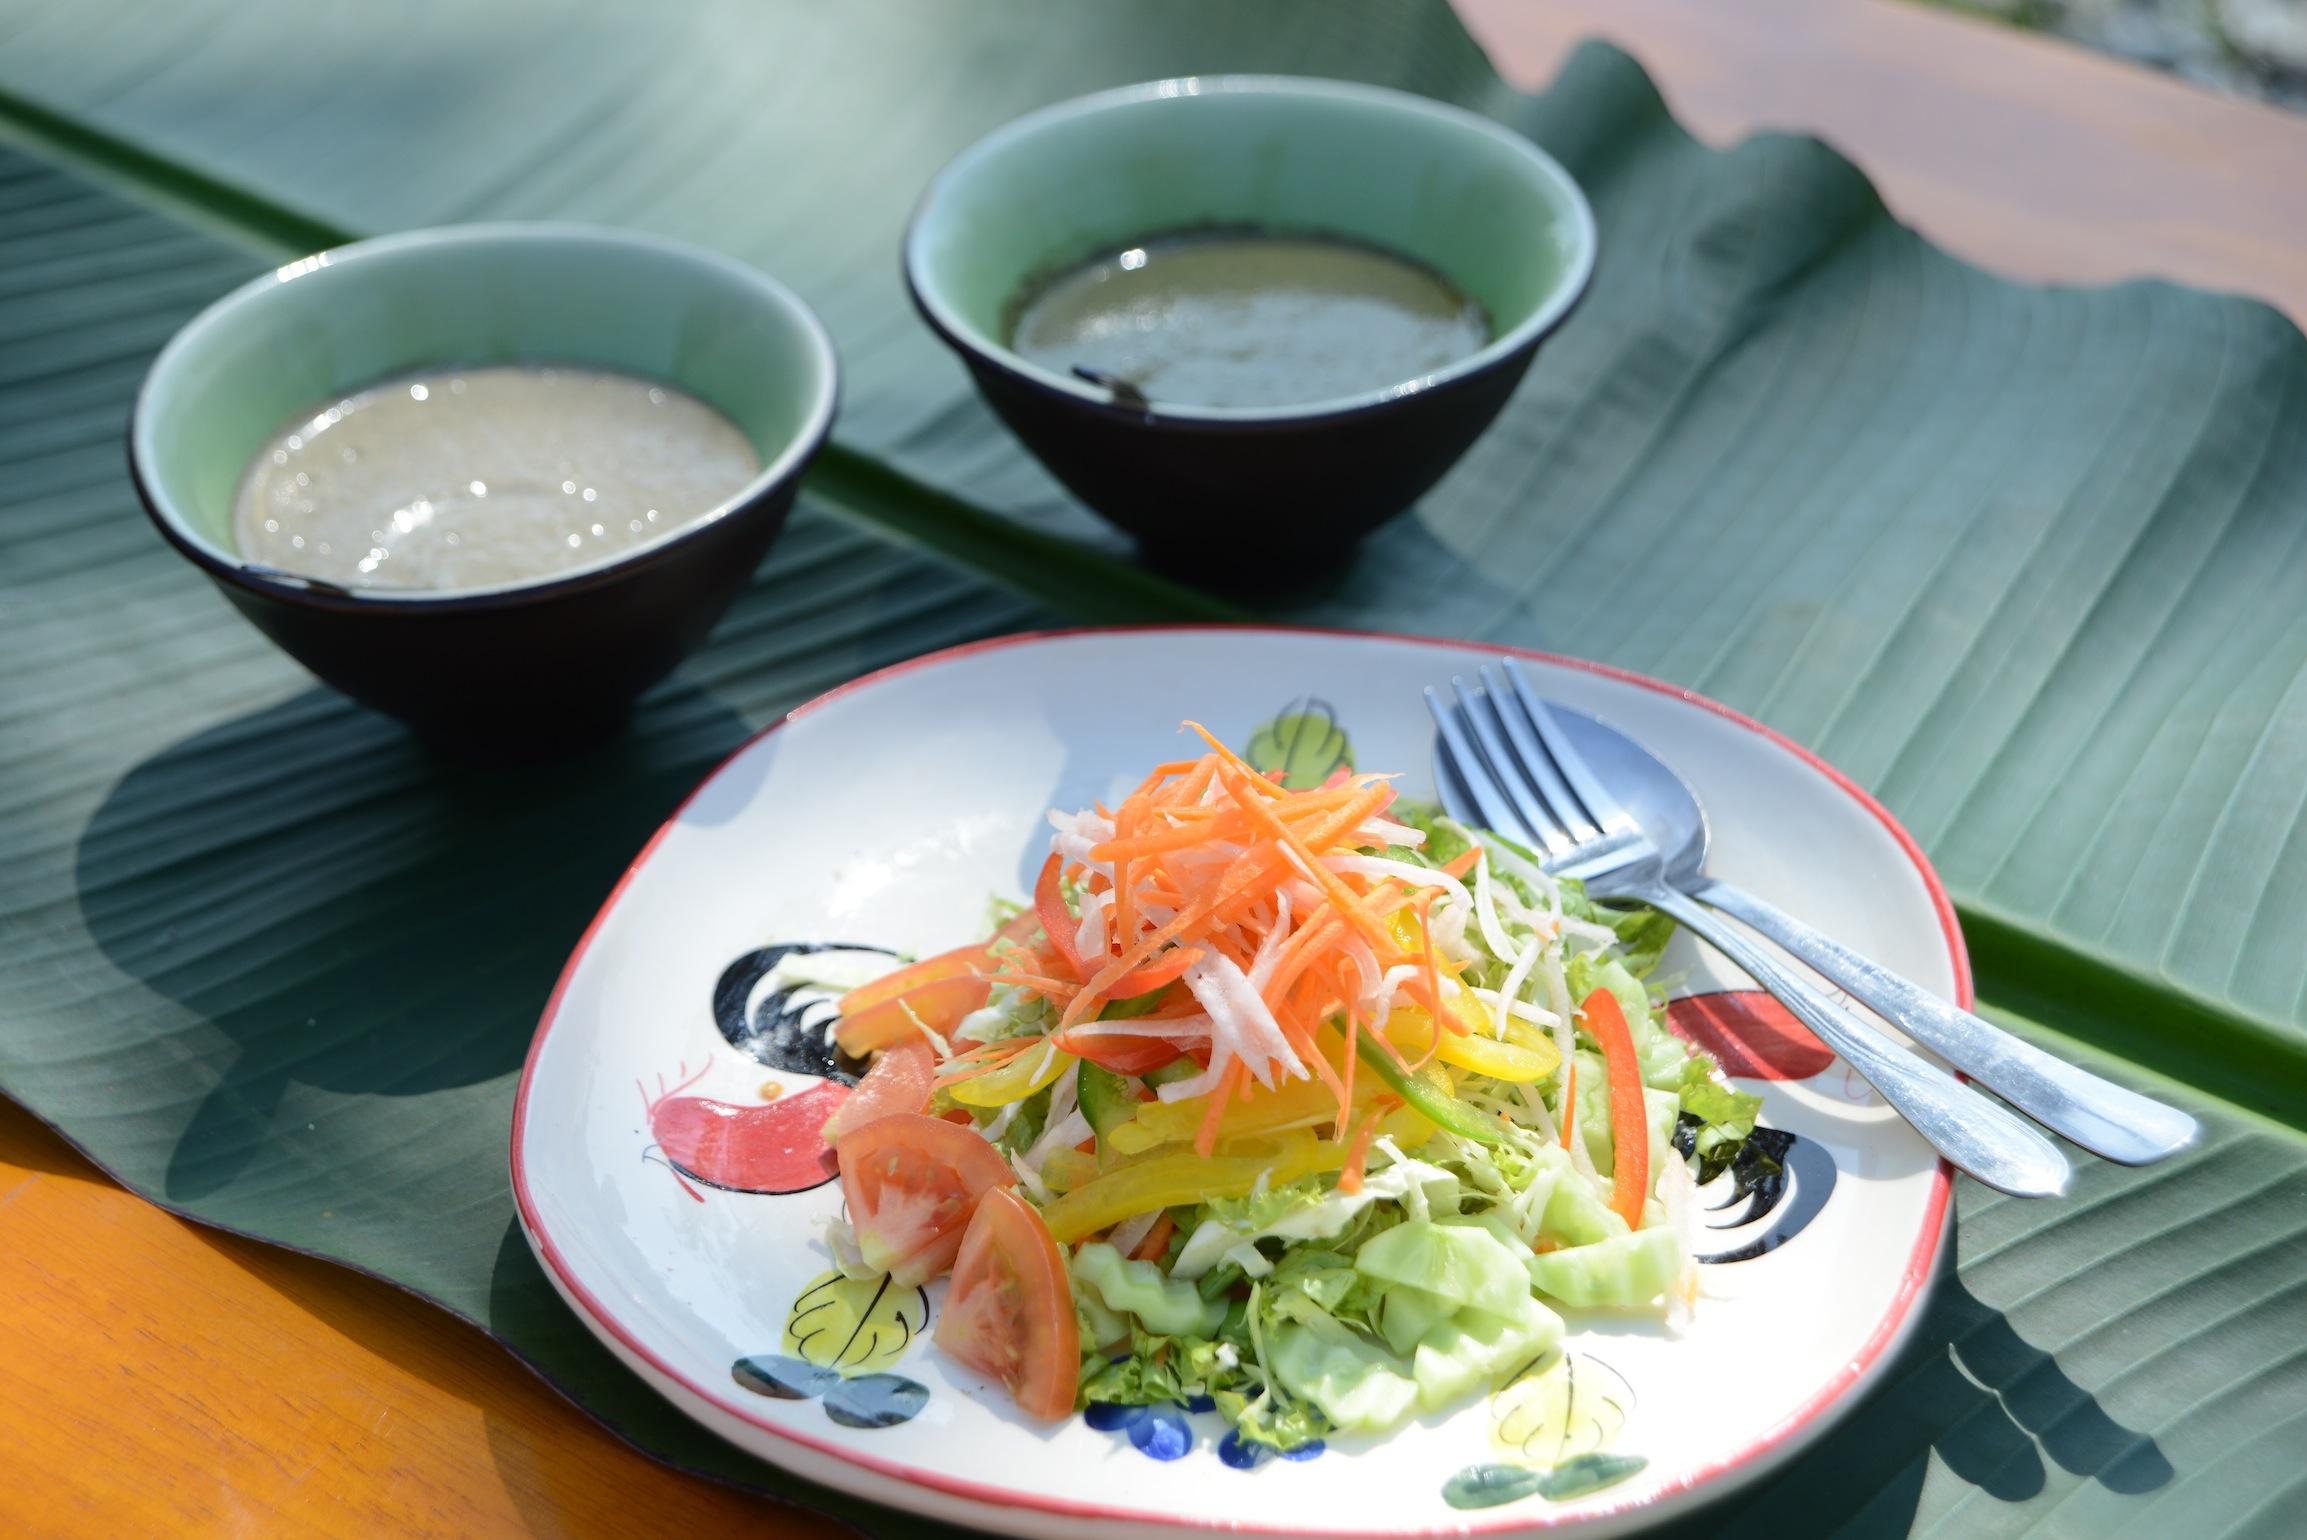 Fresh organic vegetables nourish the detox process at Museflower Retreat & Spa Chiang Rai